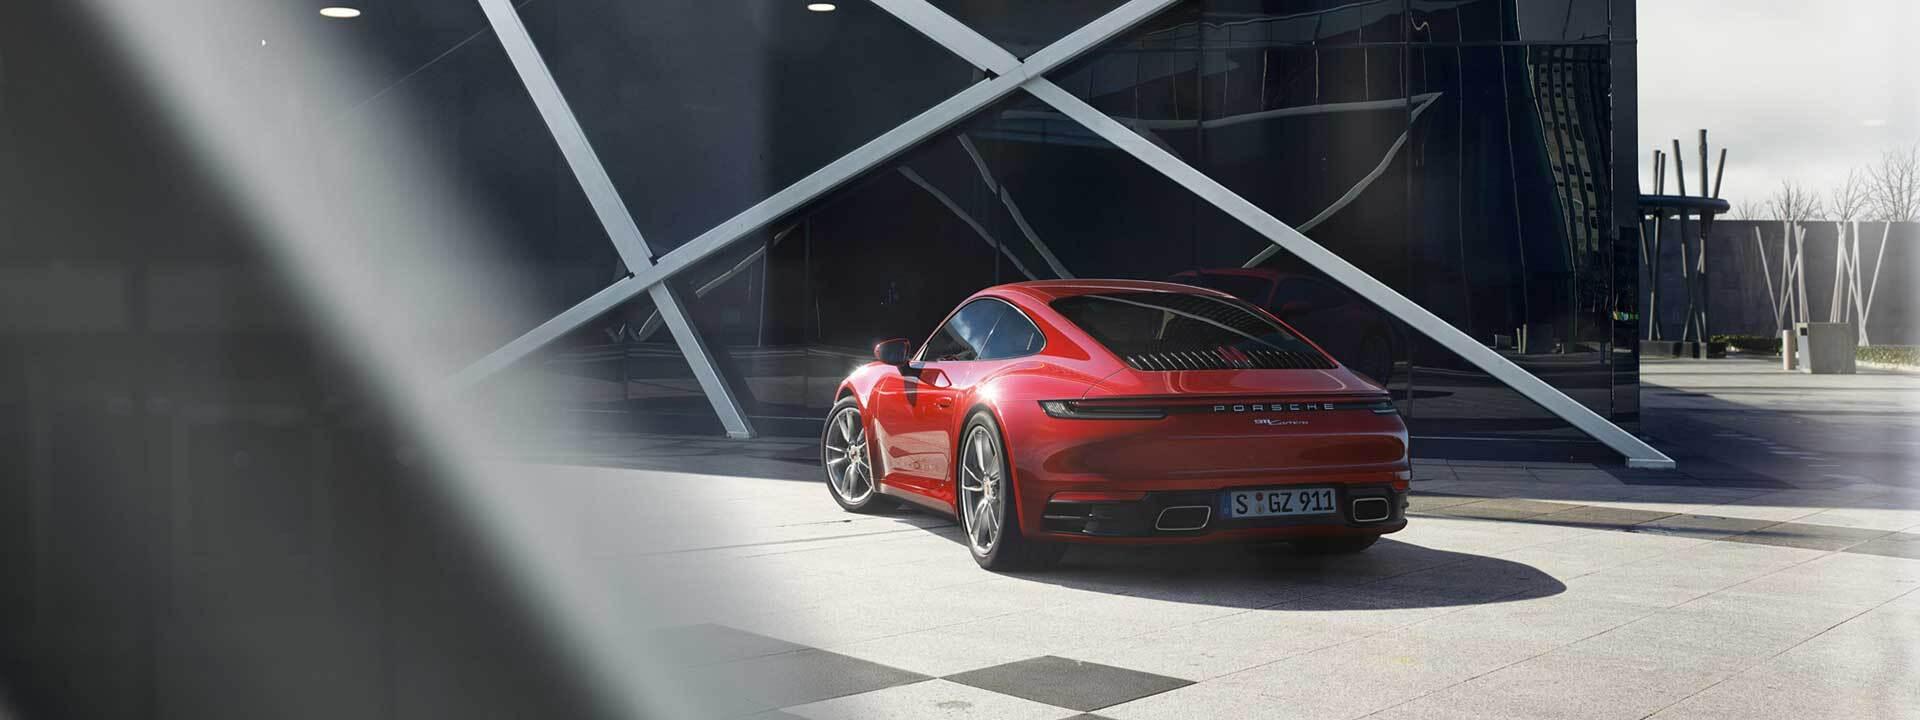 A Porsche parked in Kansas City, KS